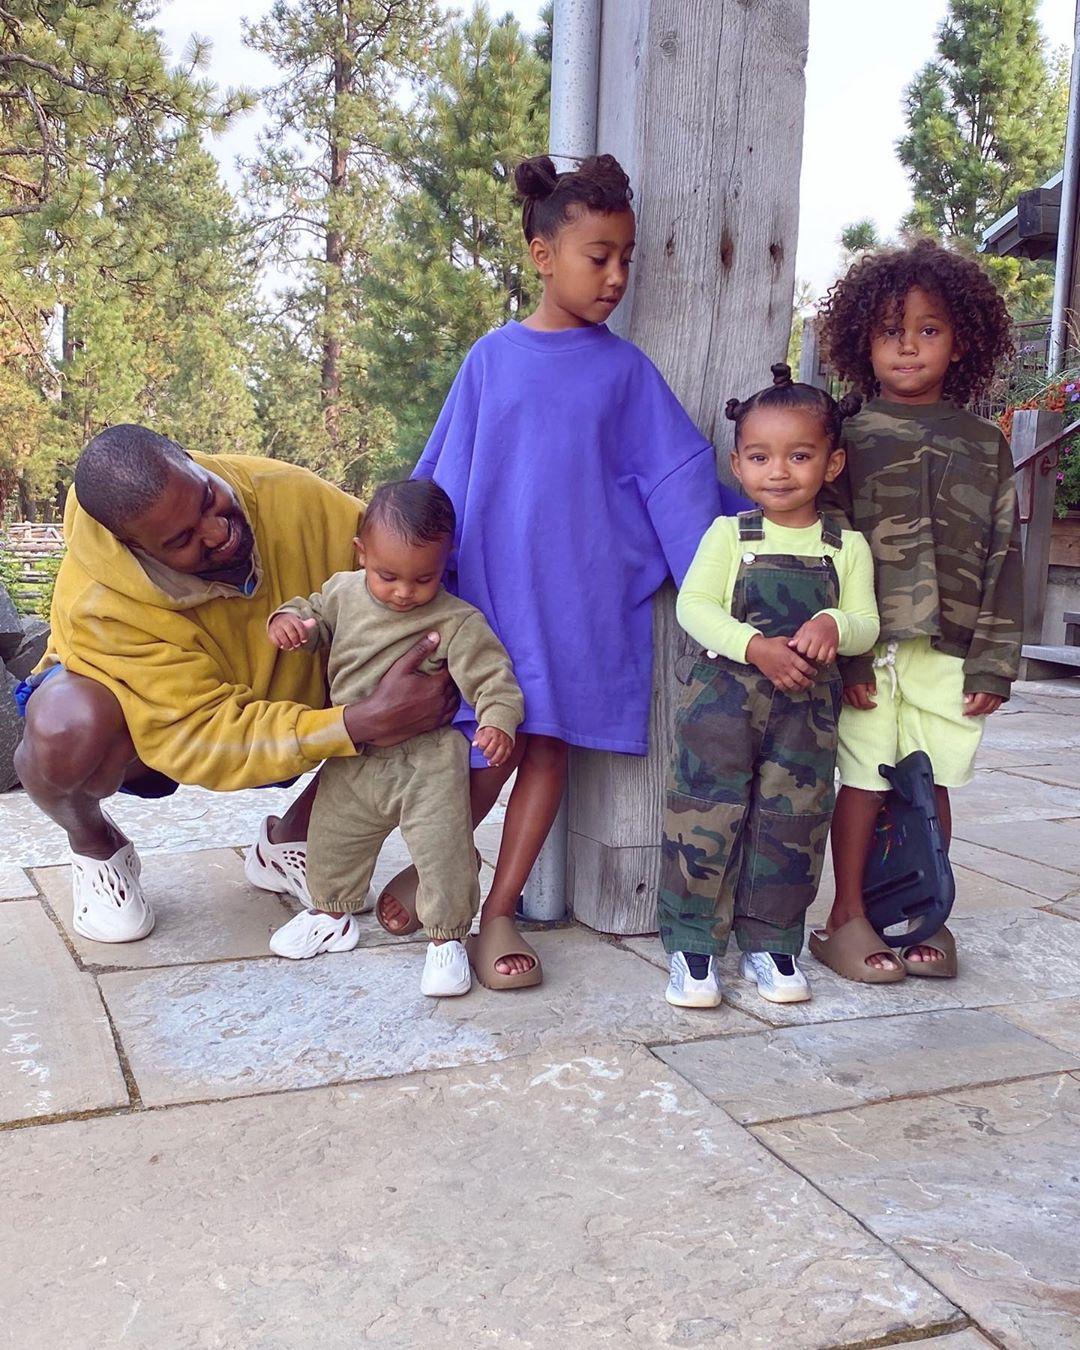 Kim Kardashian Shares Precious Photos of Her 4 Kids